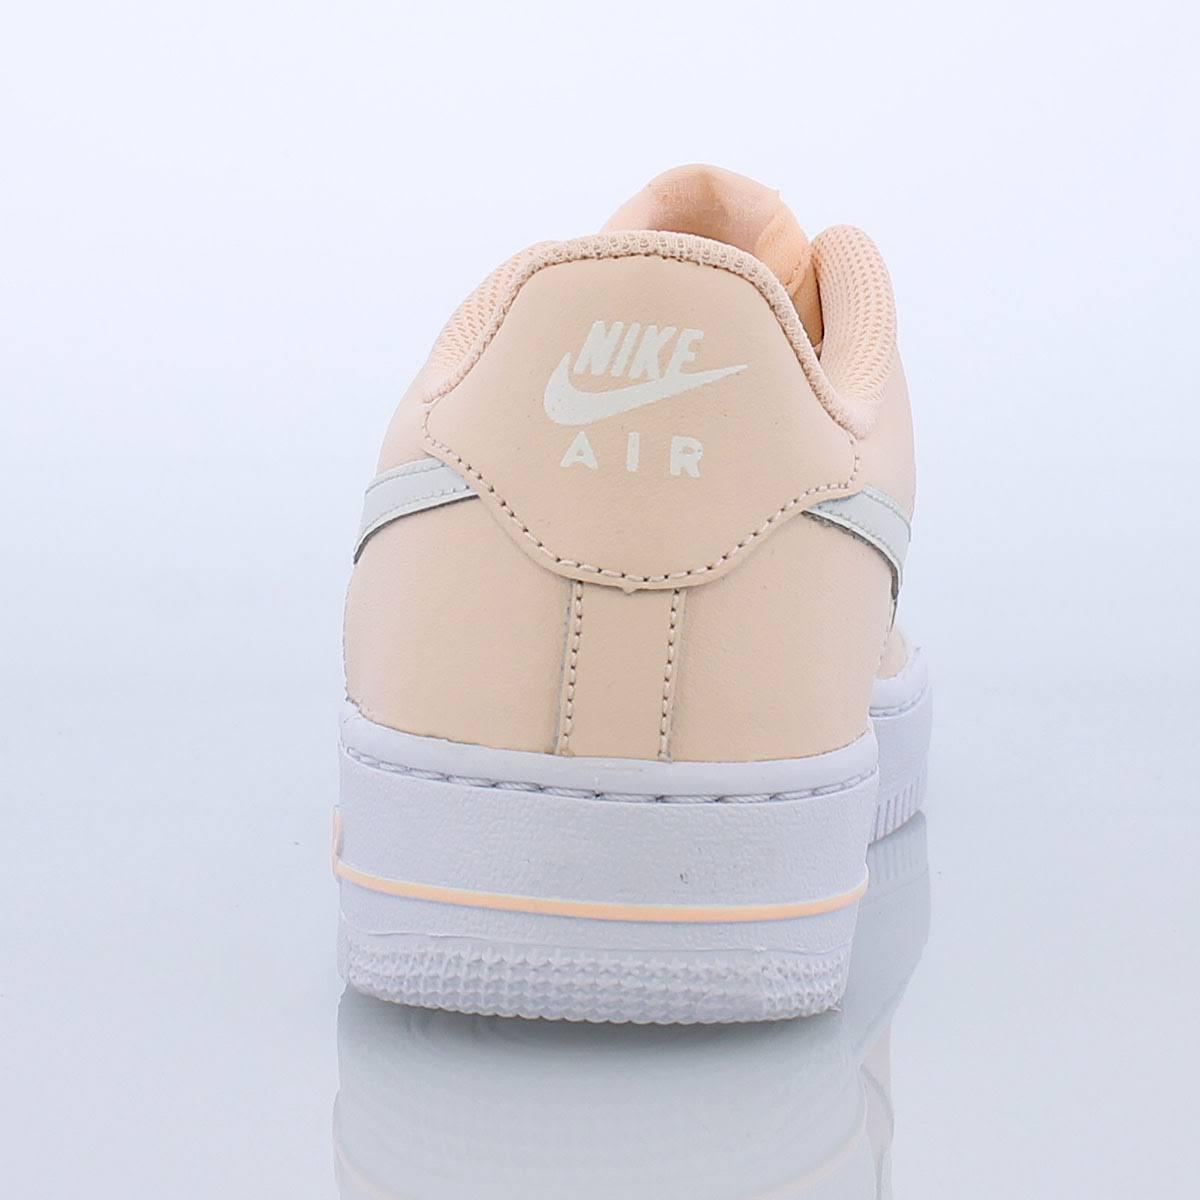 Kids Zapatillas 1 Años 5 Lv8 Nike Force Air 58w1Fq